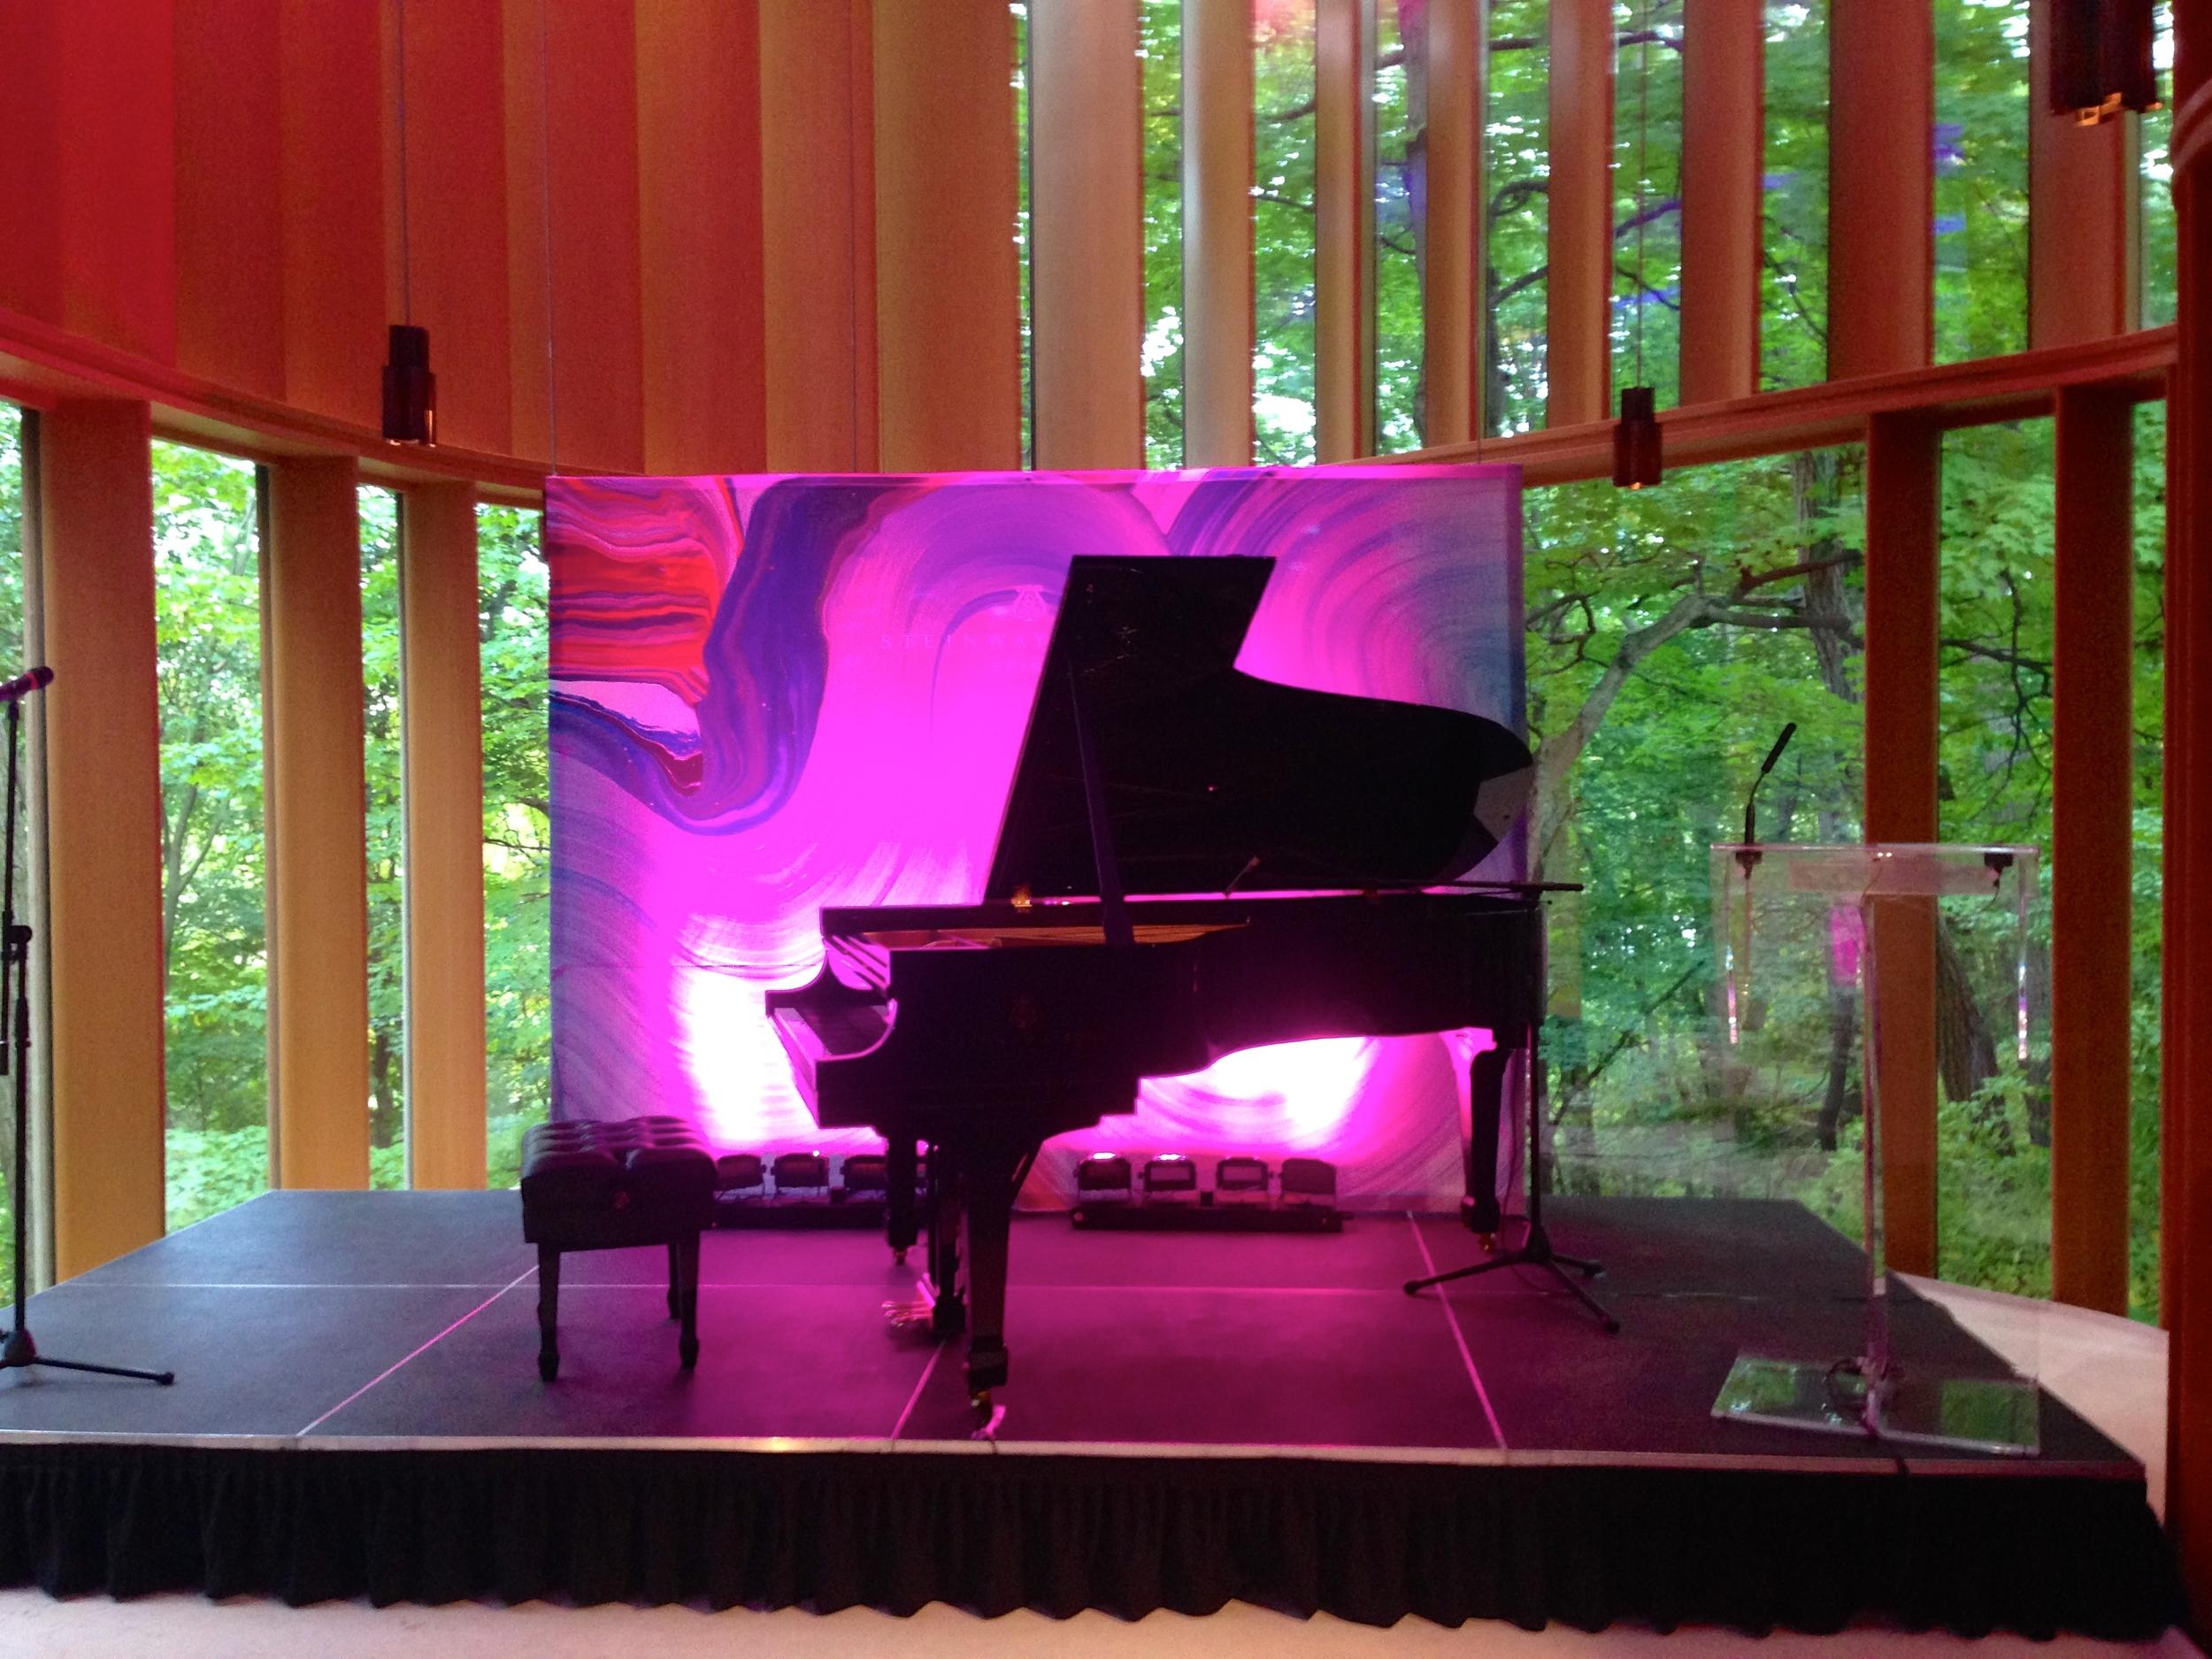 Steinway Spirio Piano launch, Integral House, Toronto, Ontario